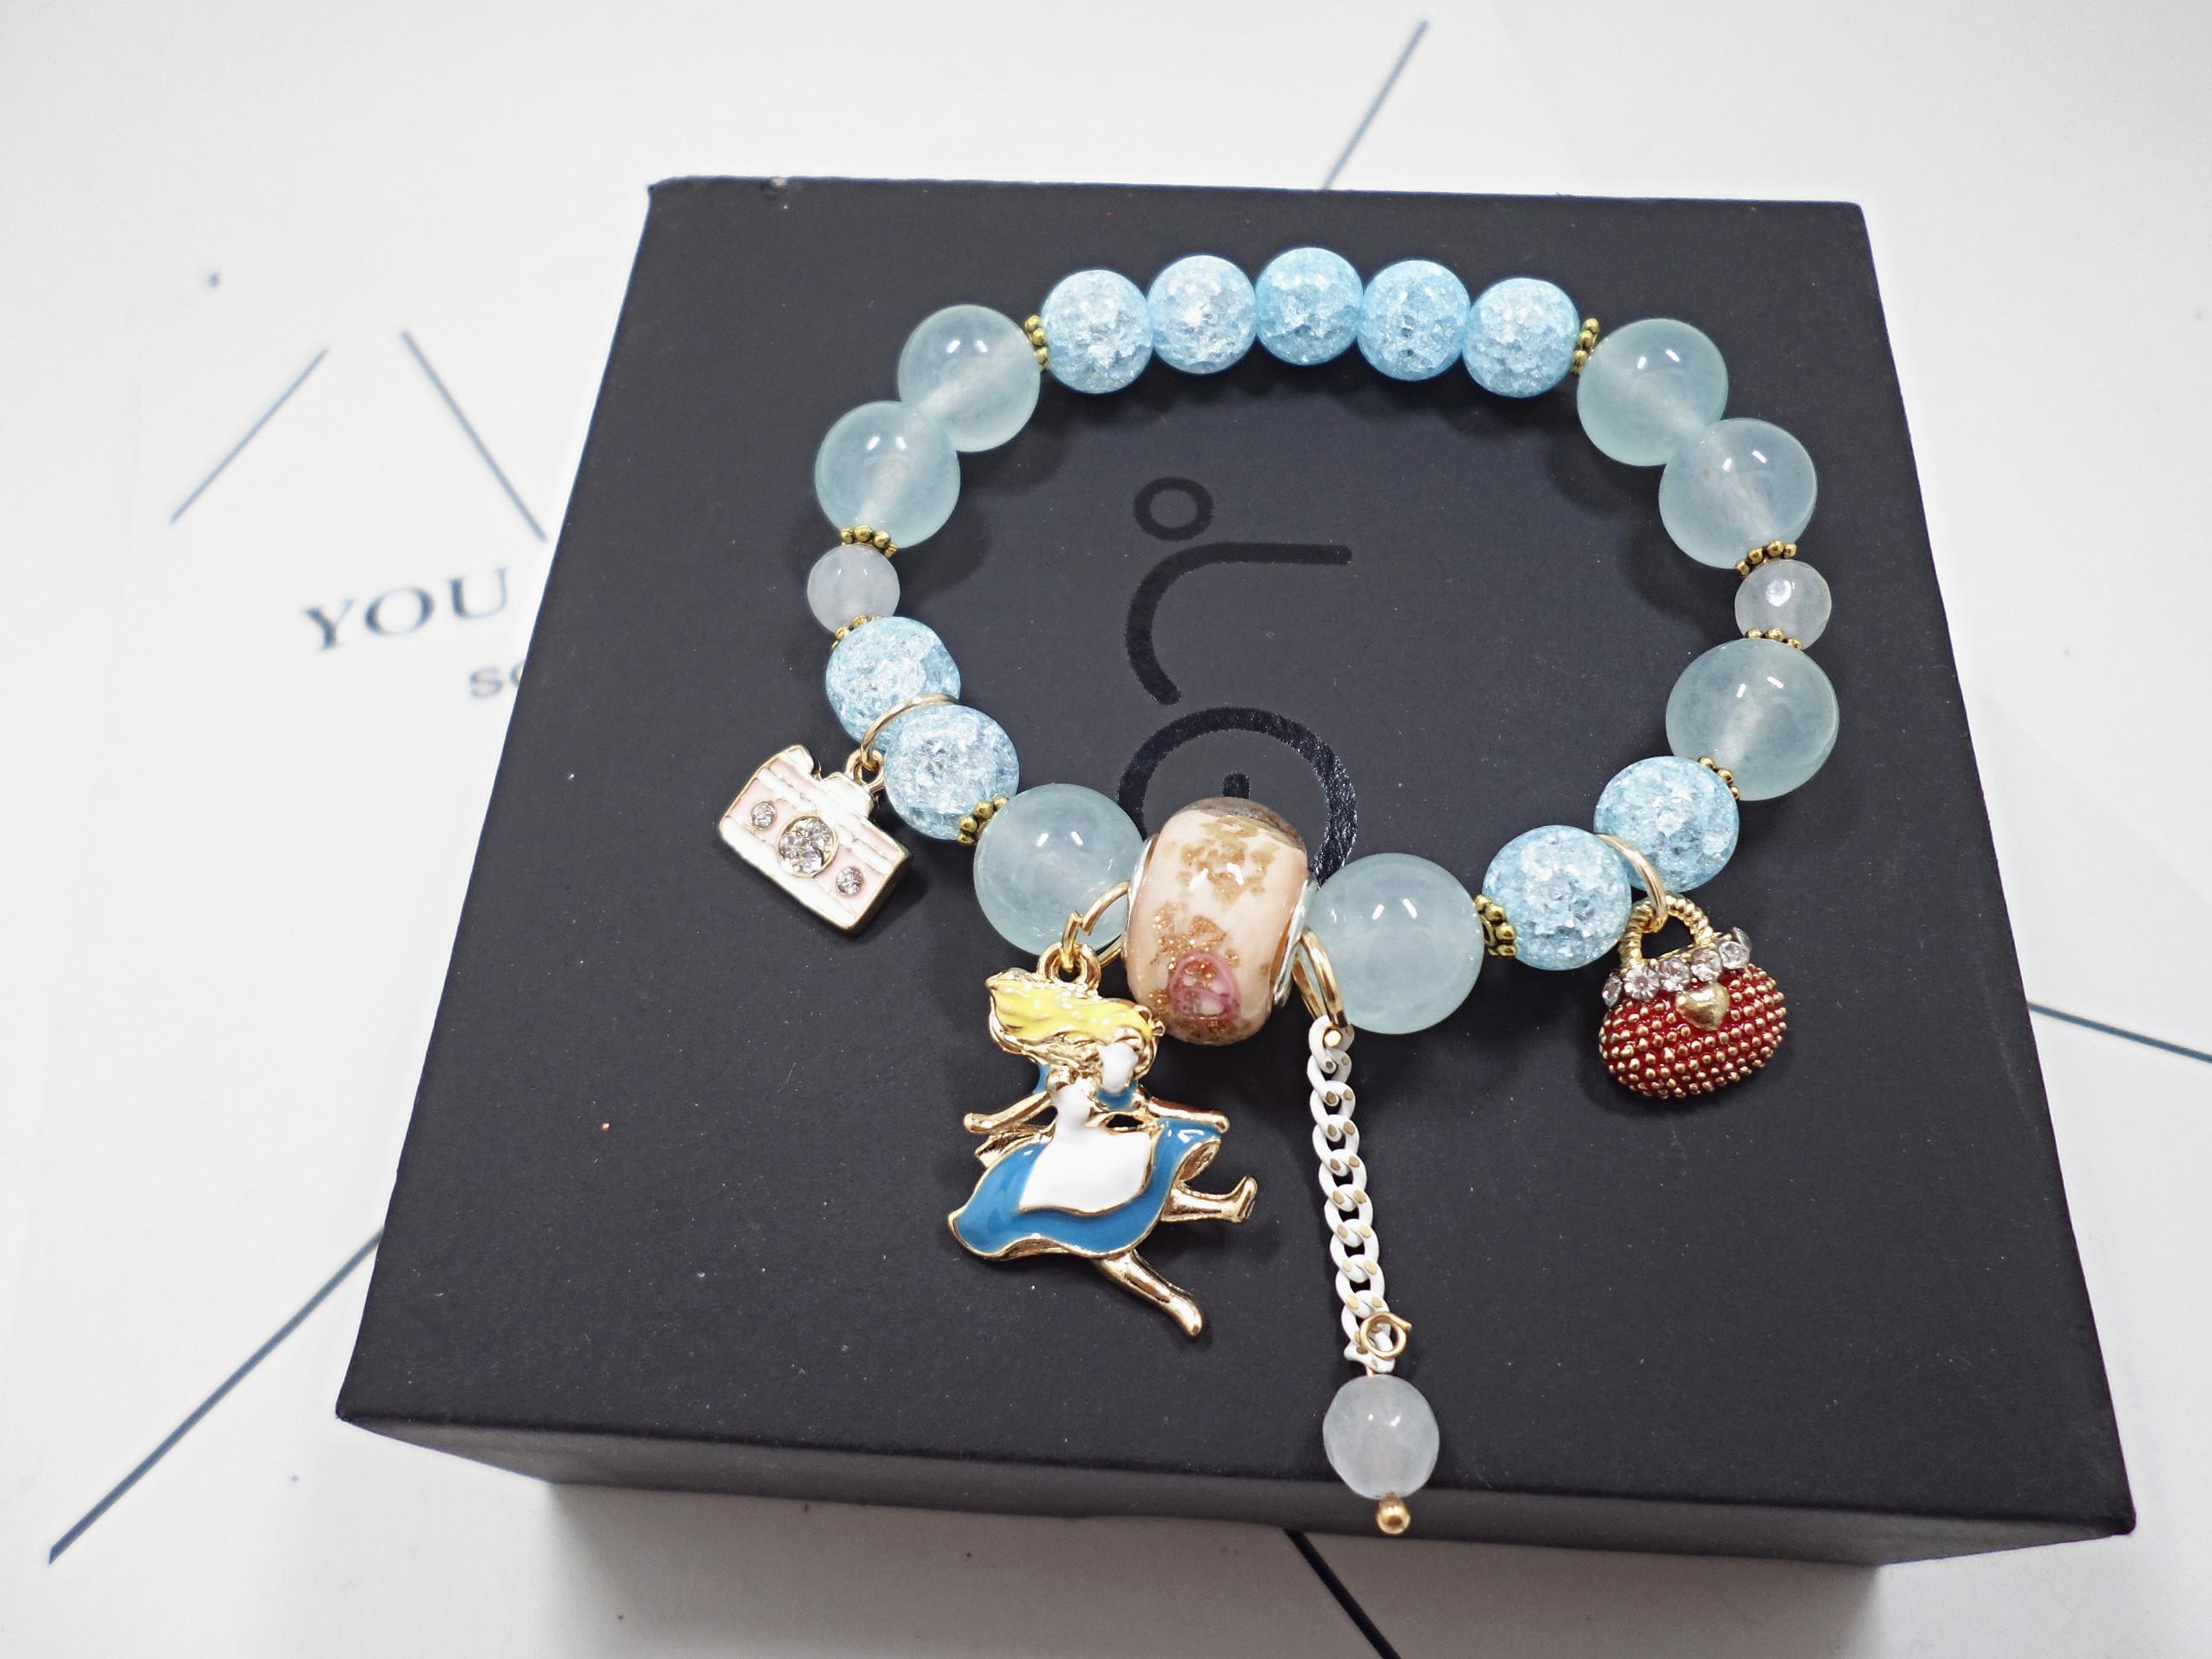 Wholesale Bohemia Girl camera crystal Bead Bracelets for Women creative jewelry wholesale Natural Stone Charms Wristband Gift  VGB097 3